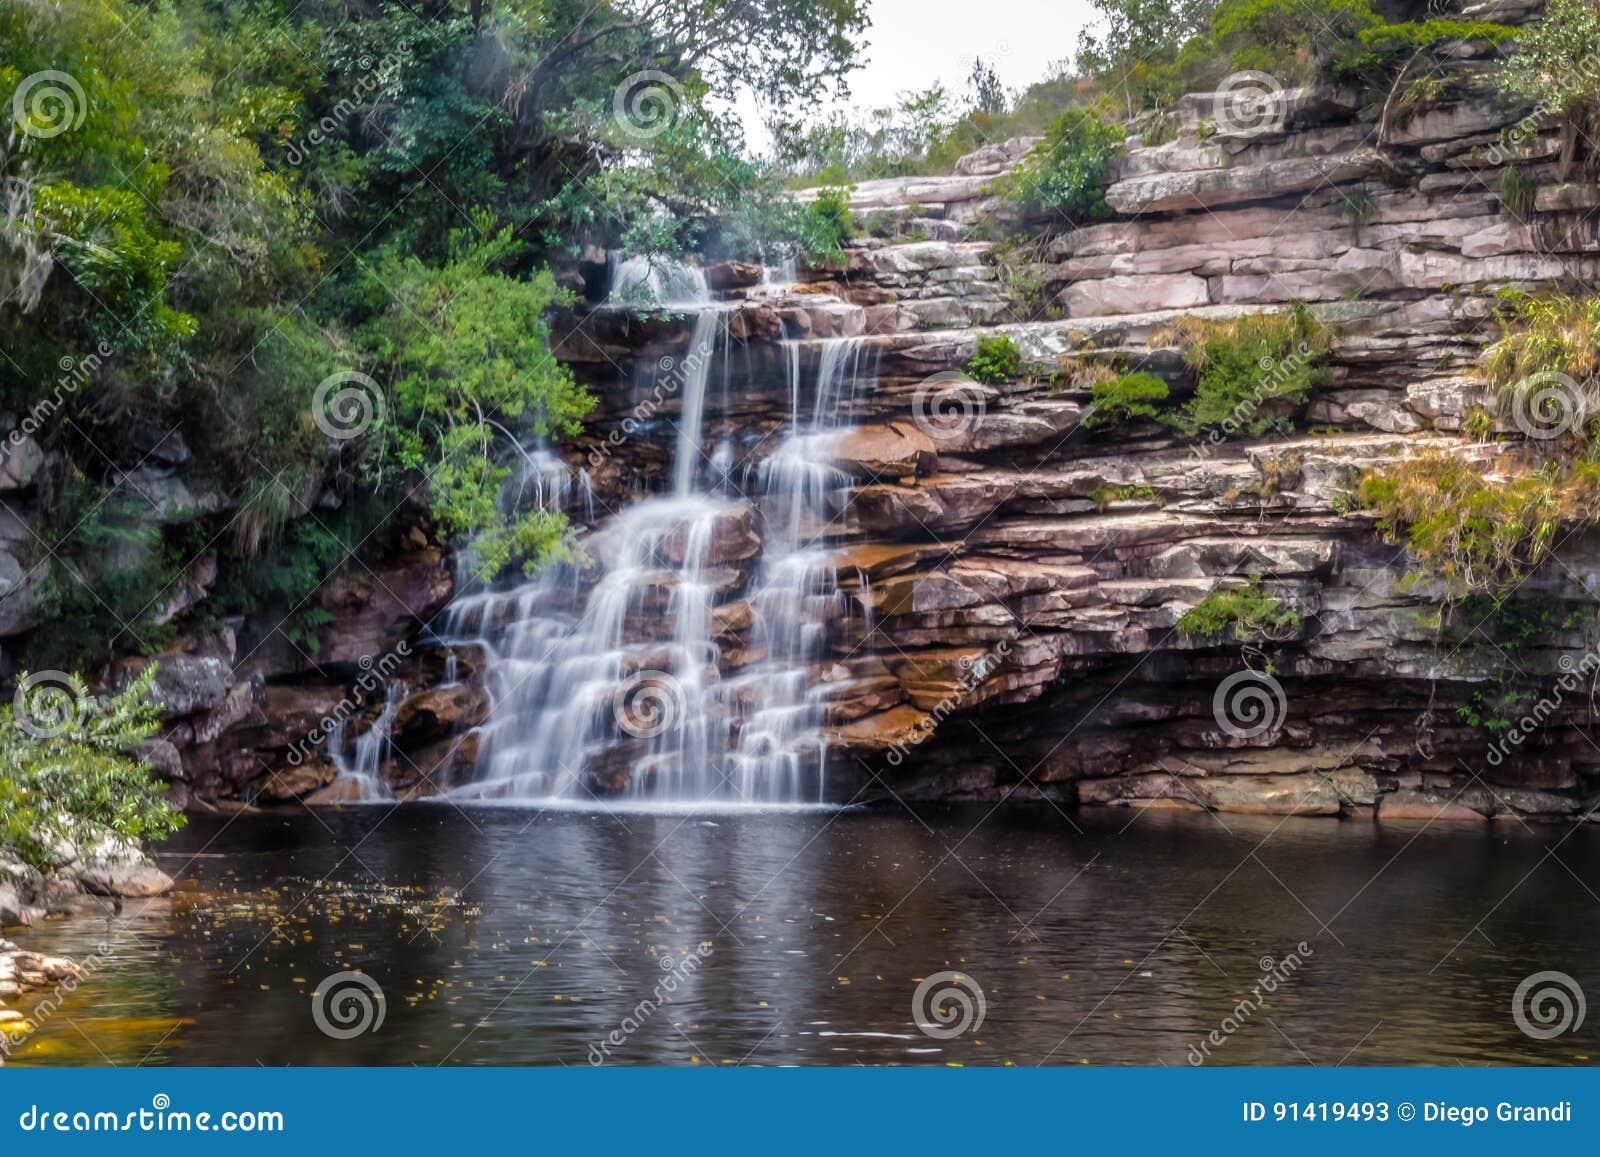 Poço do Diabo Waterfall in Mucugezinho-Rivier - Chapada Diamantina, Bahia, Brazilië